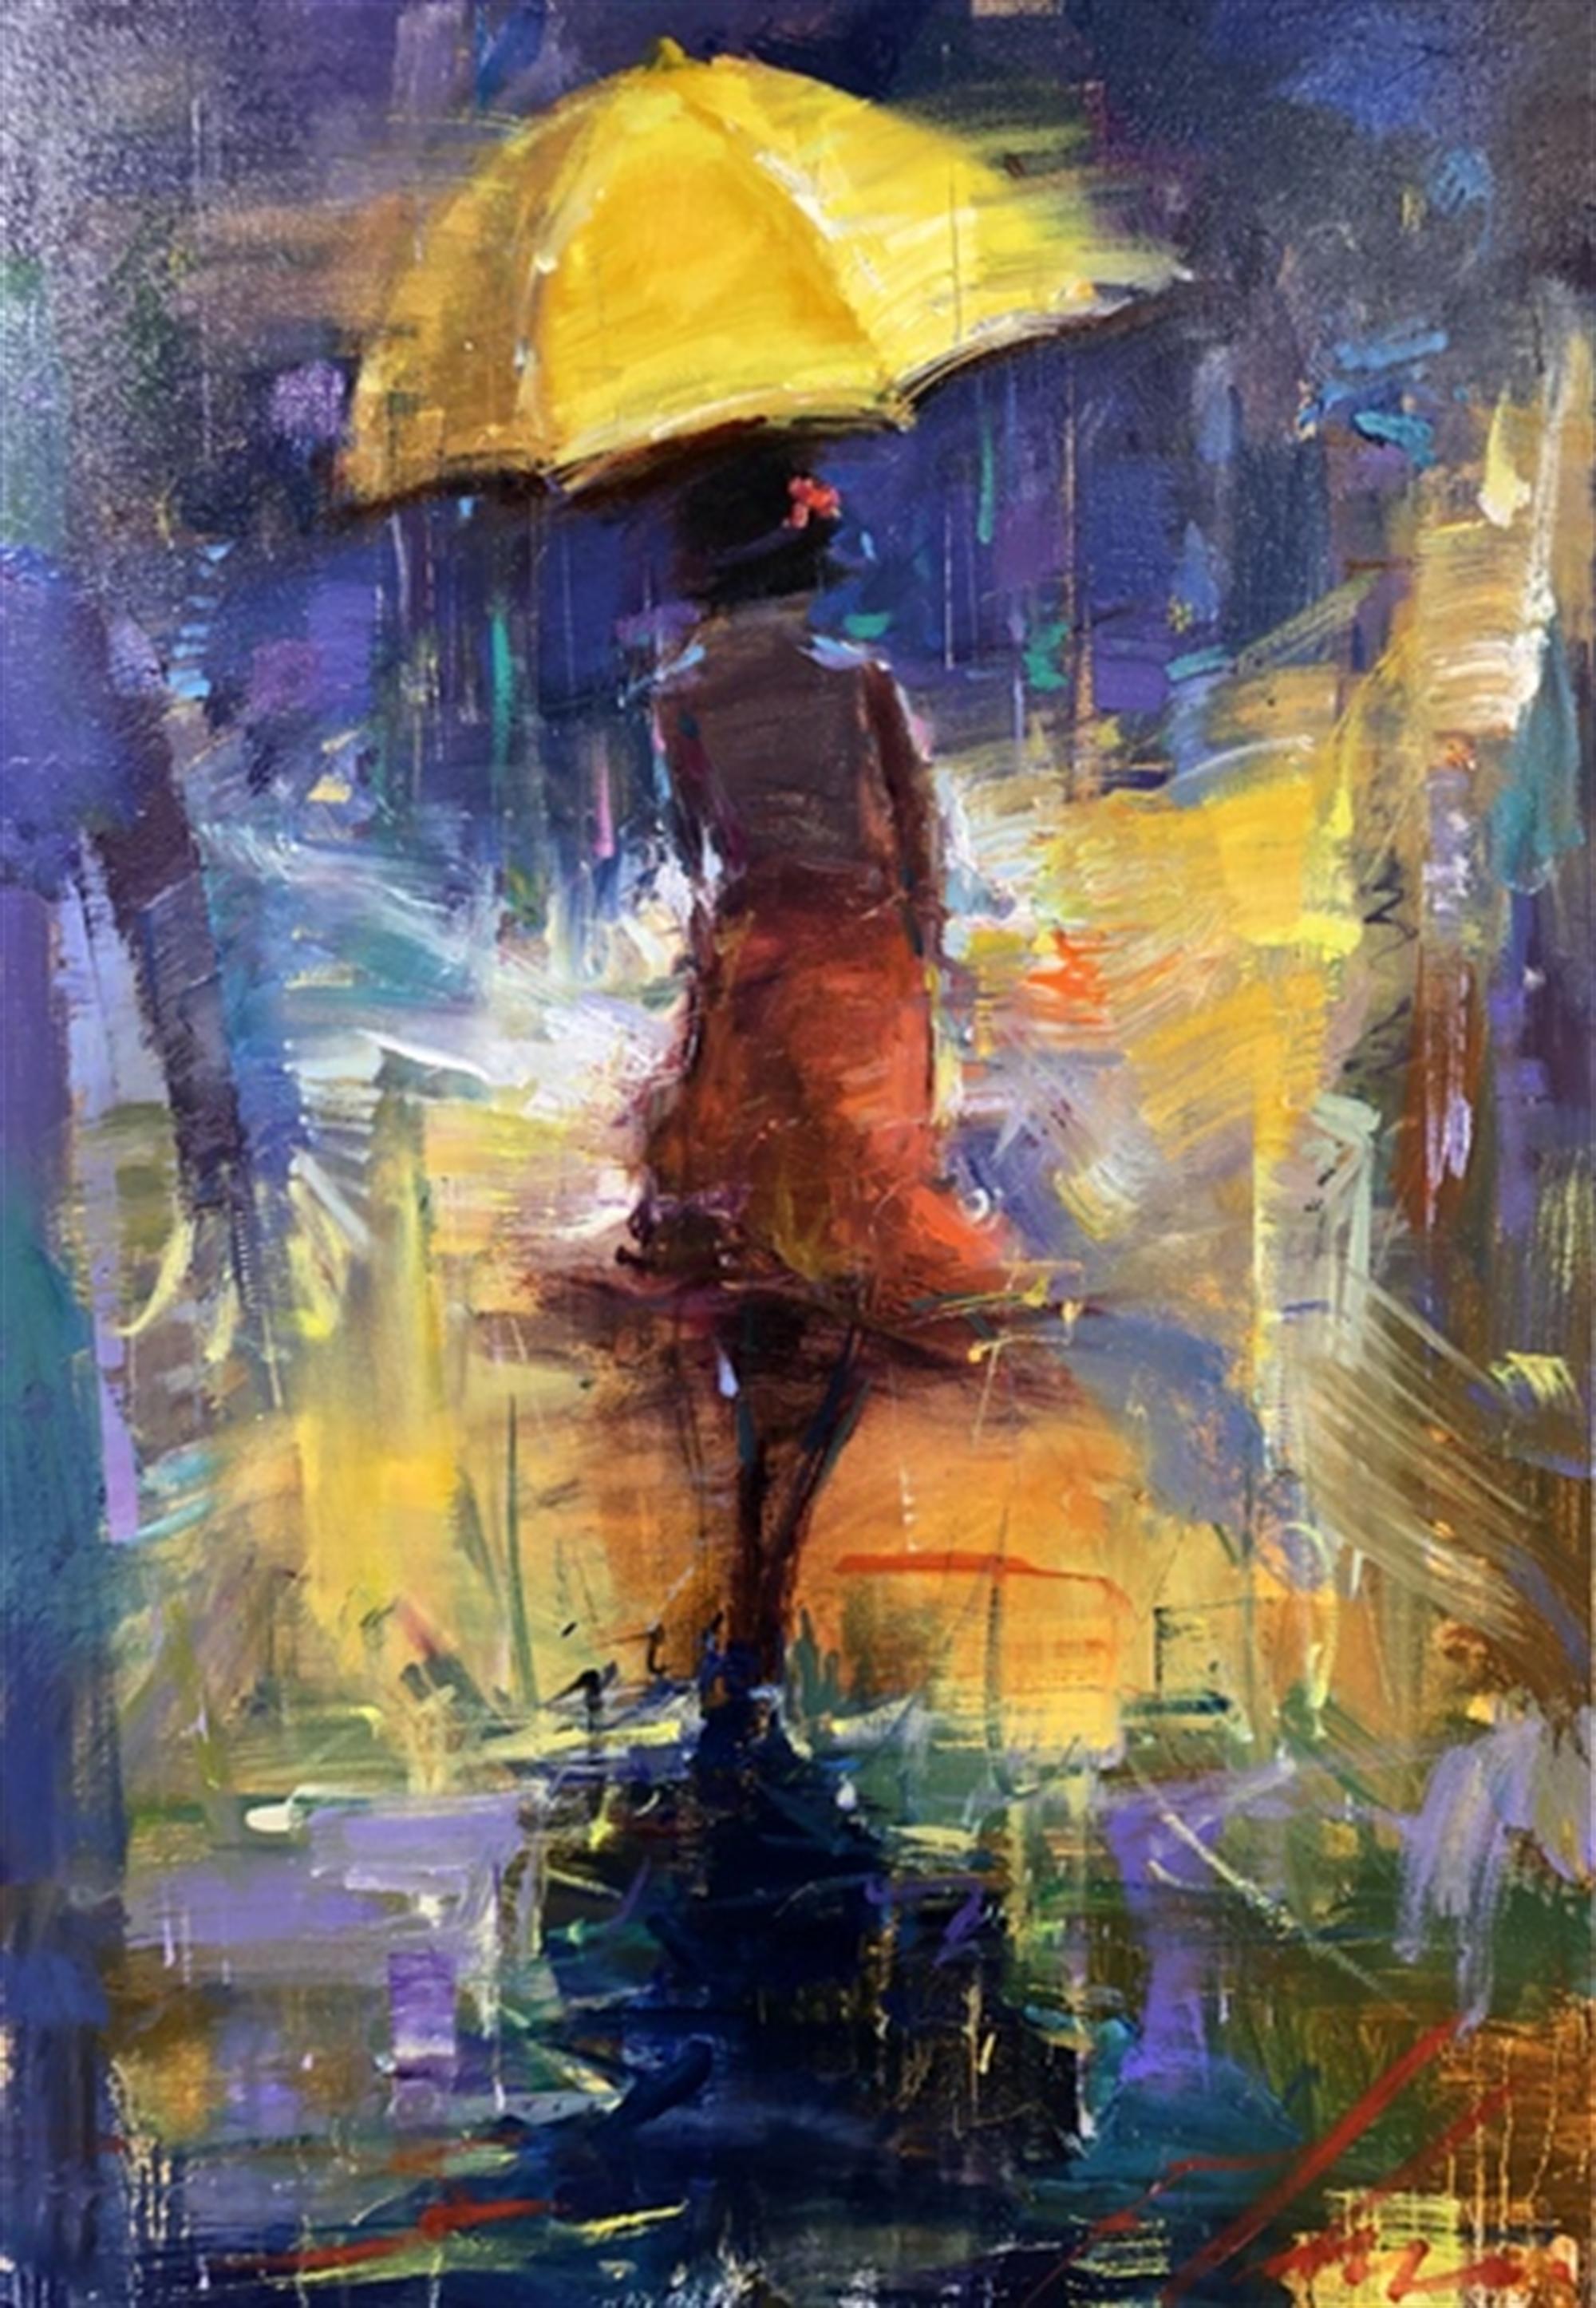 Golden Light by Michael Flohr